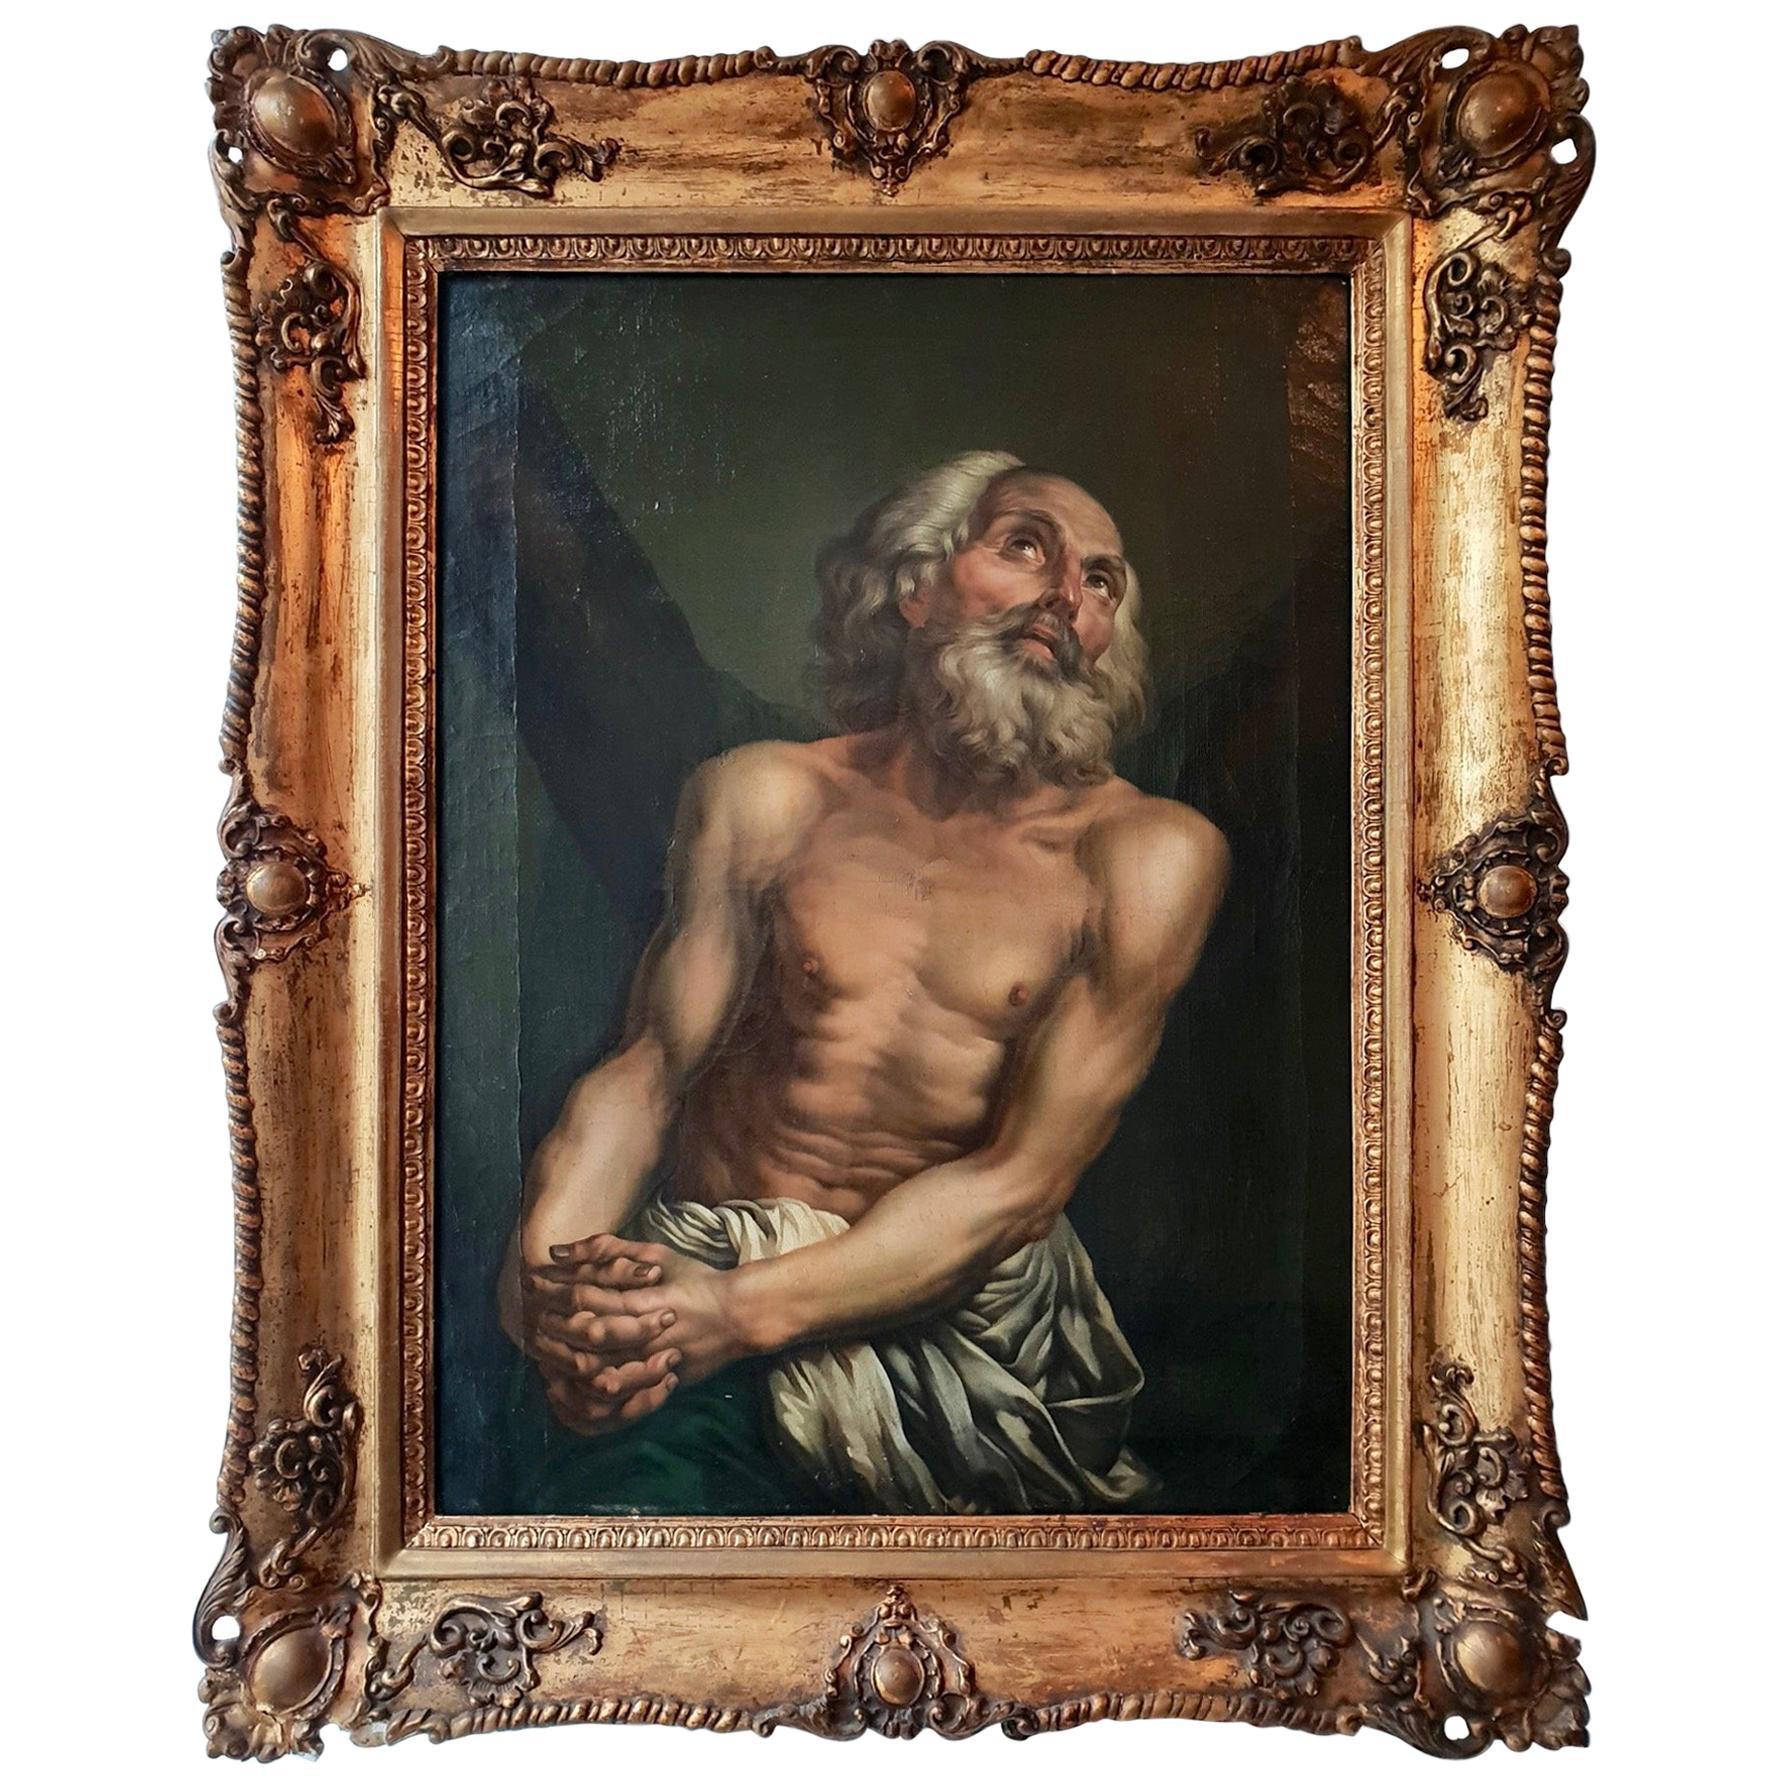 Fine Oil on Canvas Inverse Copy of Saint Andrew by Anton Pavlovich Losenko